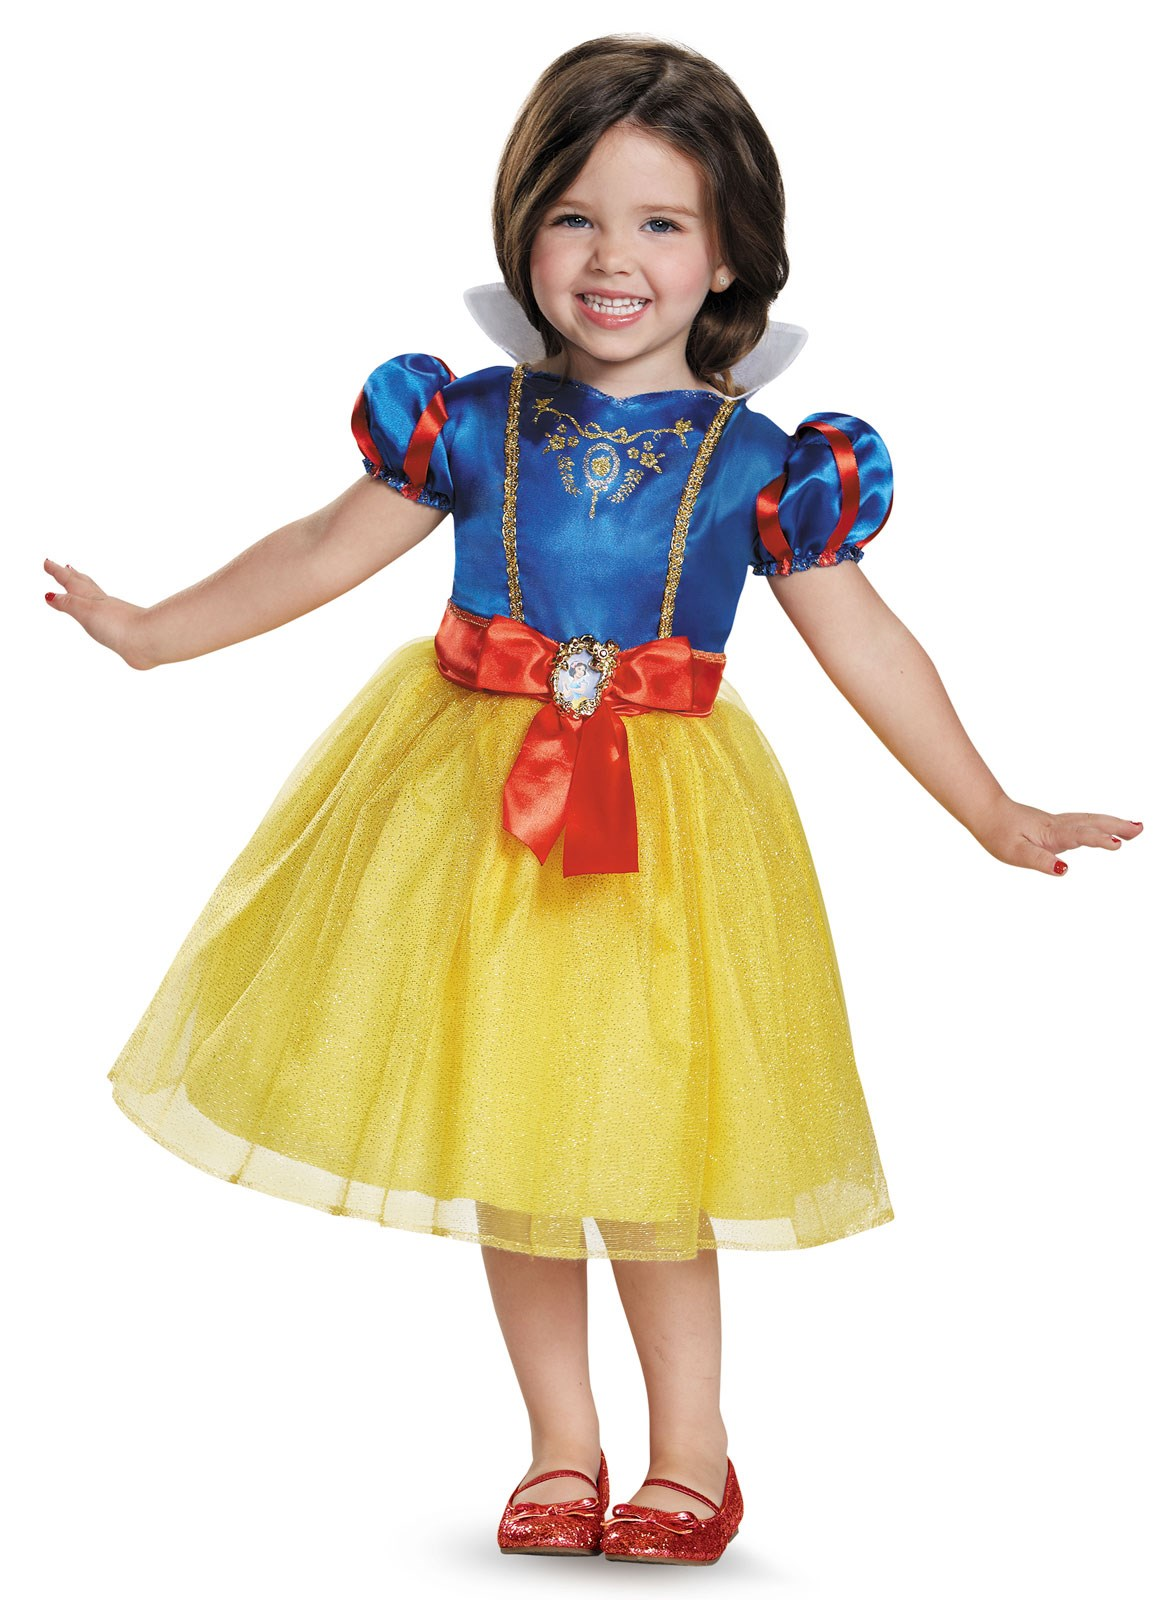 Girls Costumes For Halloween | BuyCostumes.com